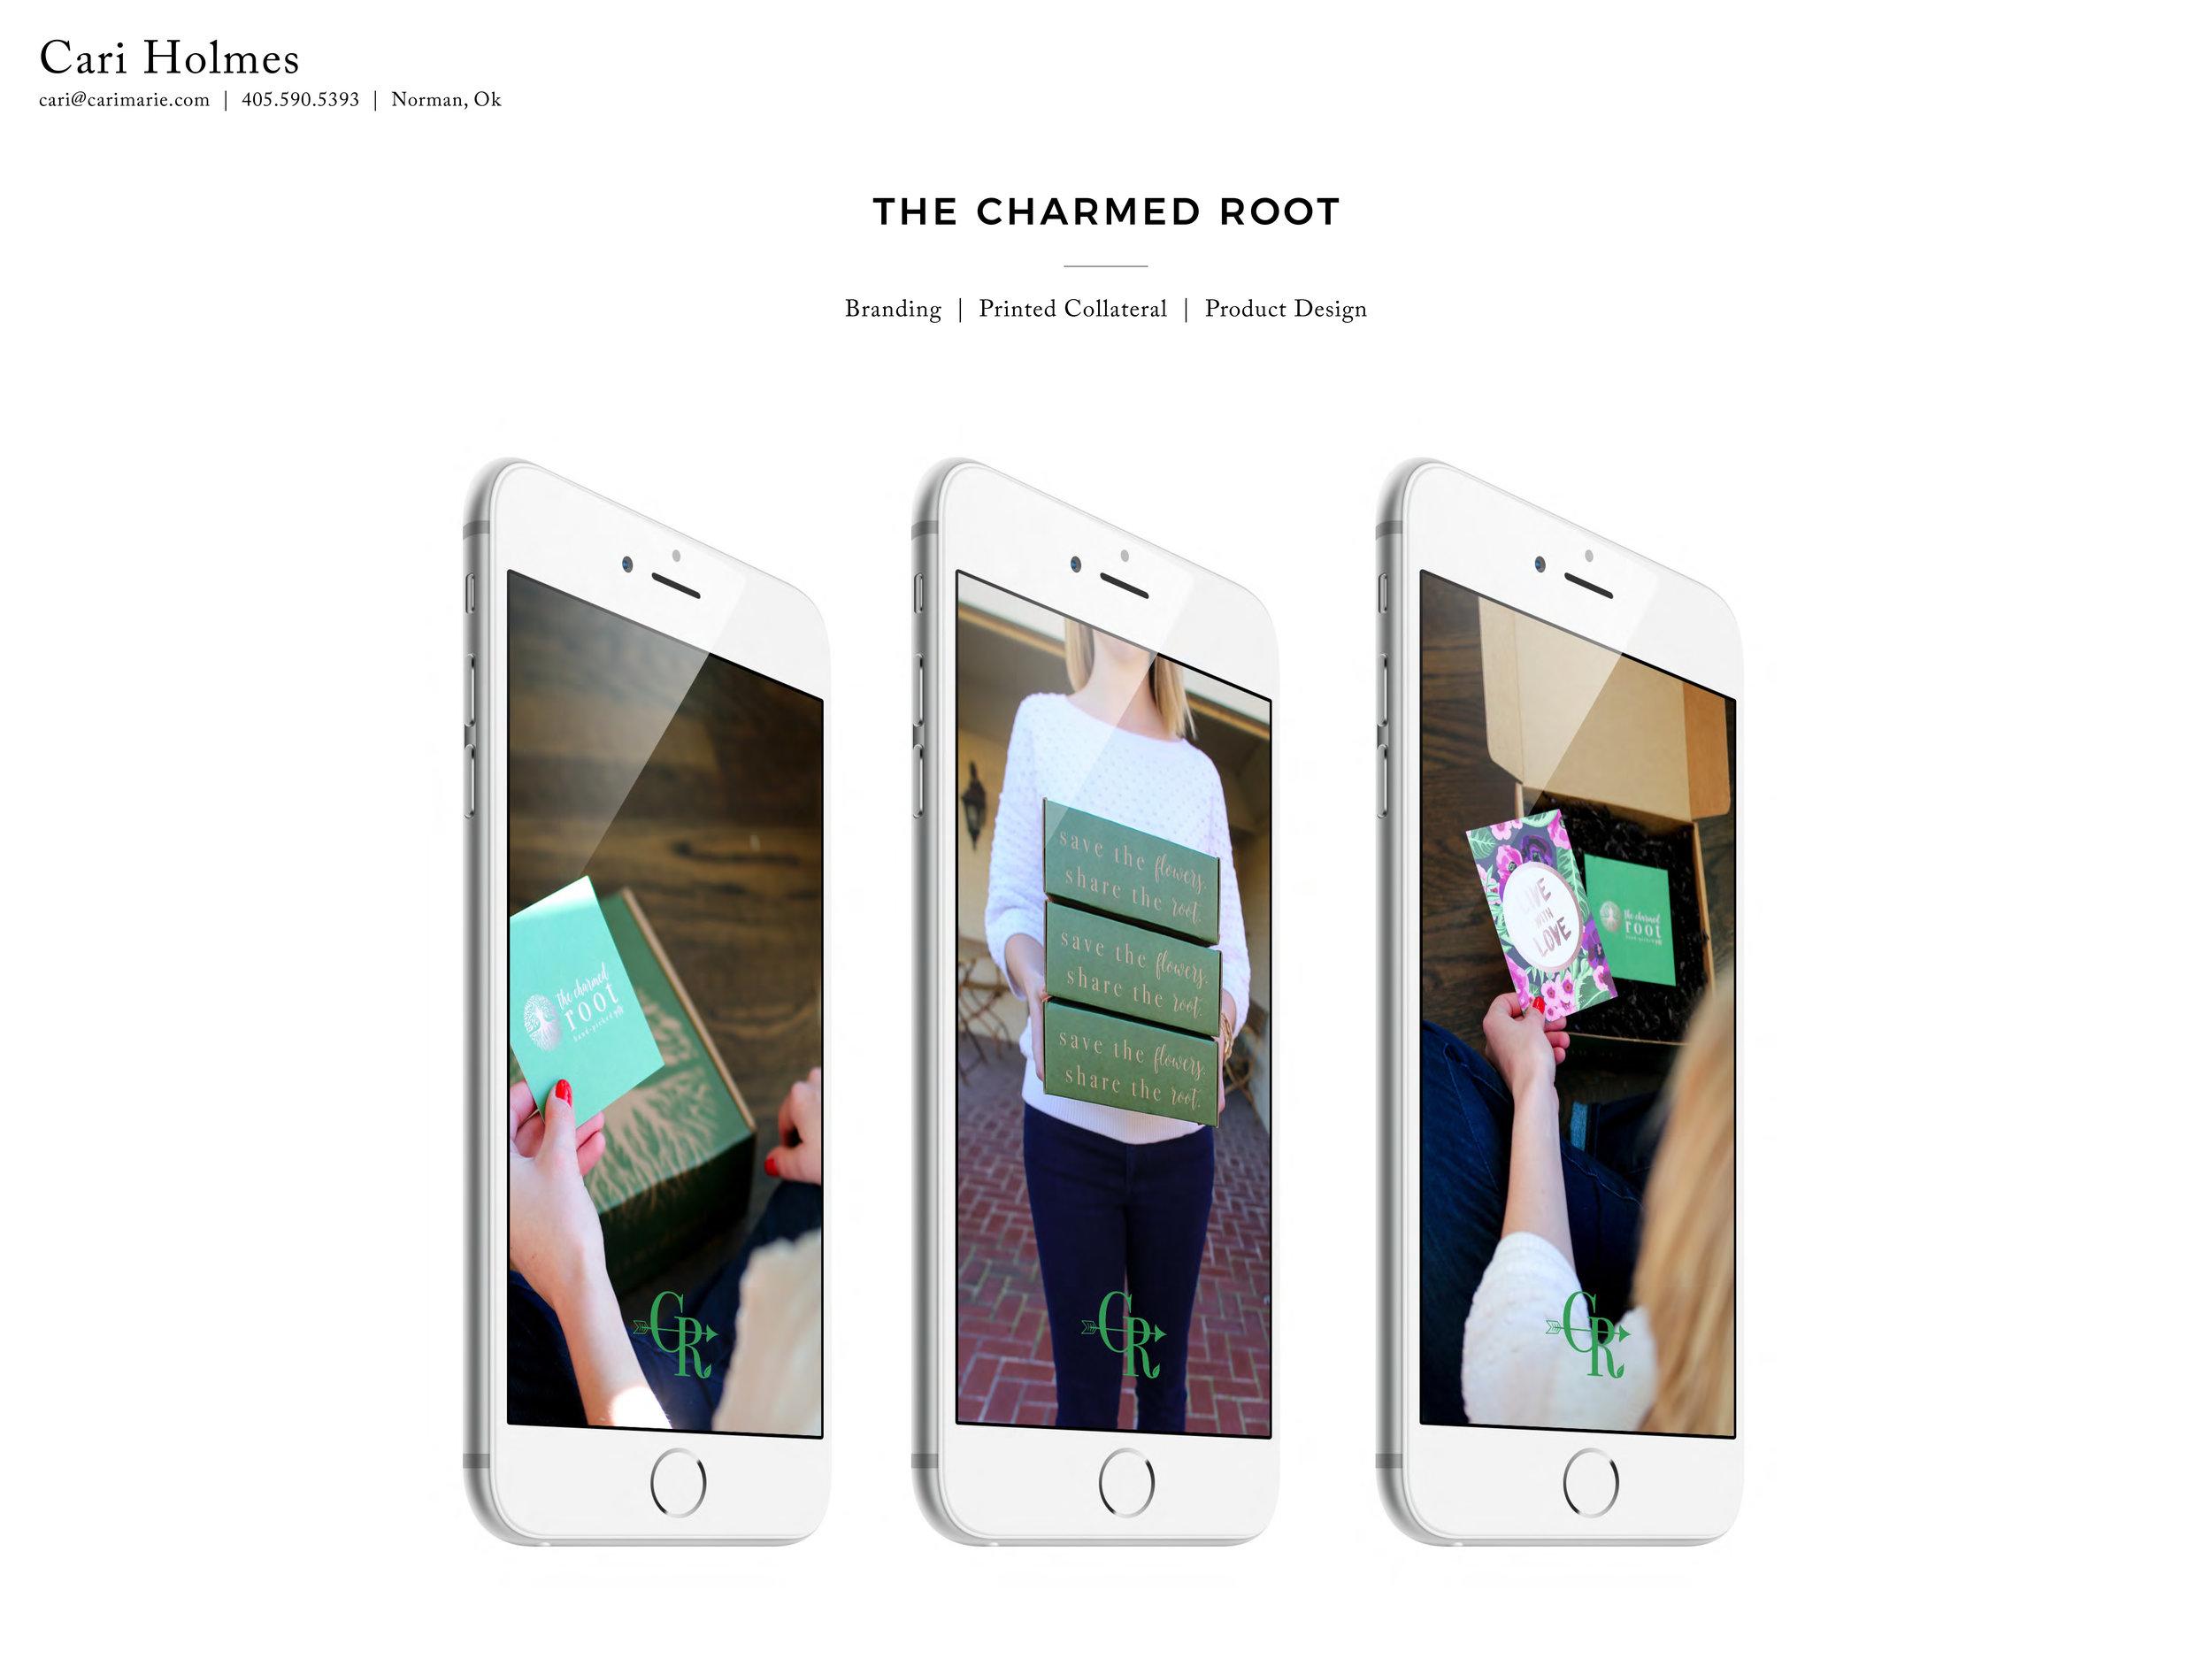 cari_m_holmes_portfolio_2017-5 copy.jpg